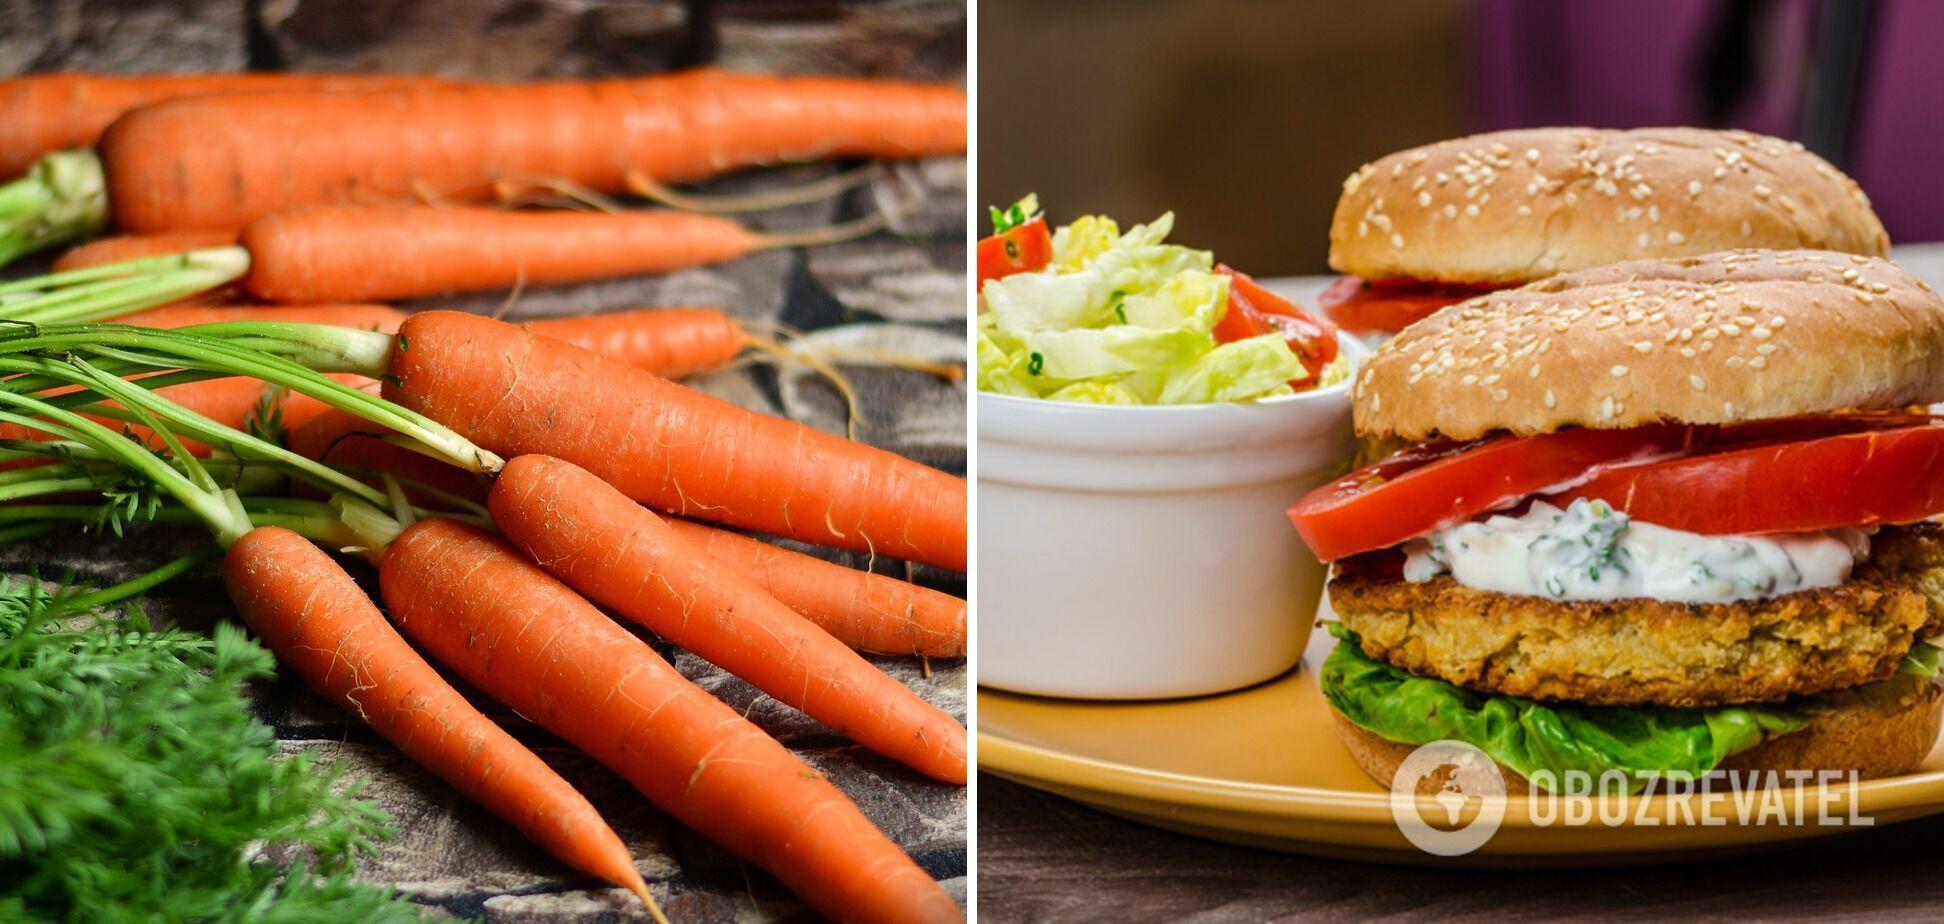 Бургер з котлетою з буряка і моркви